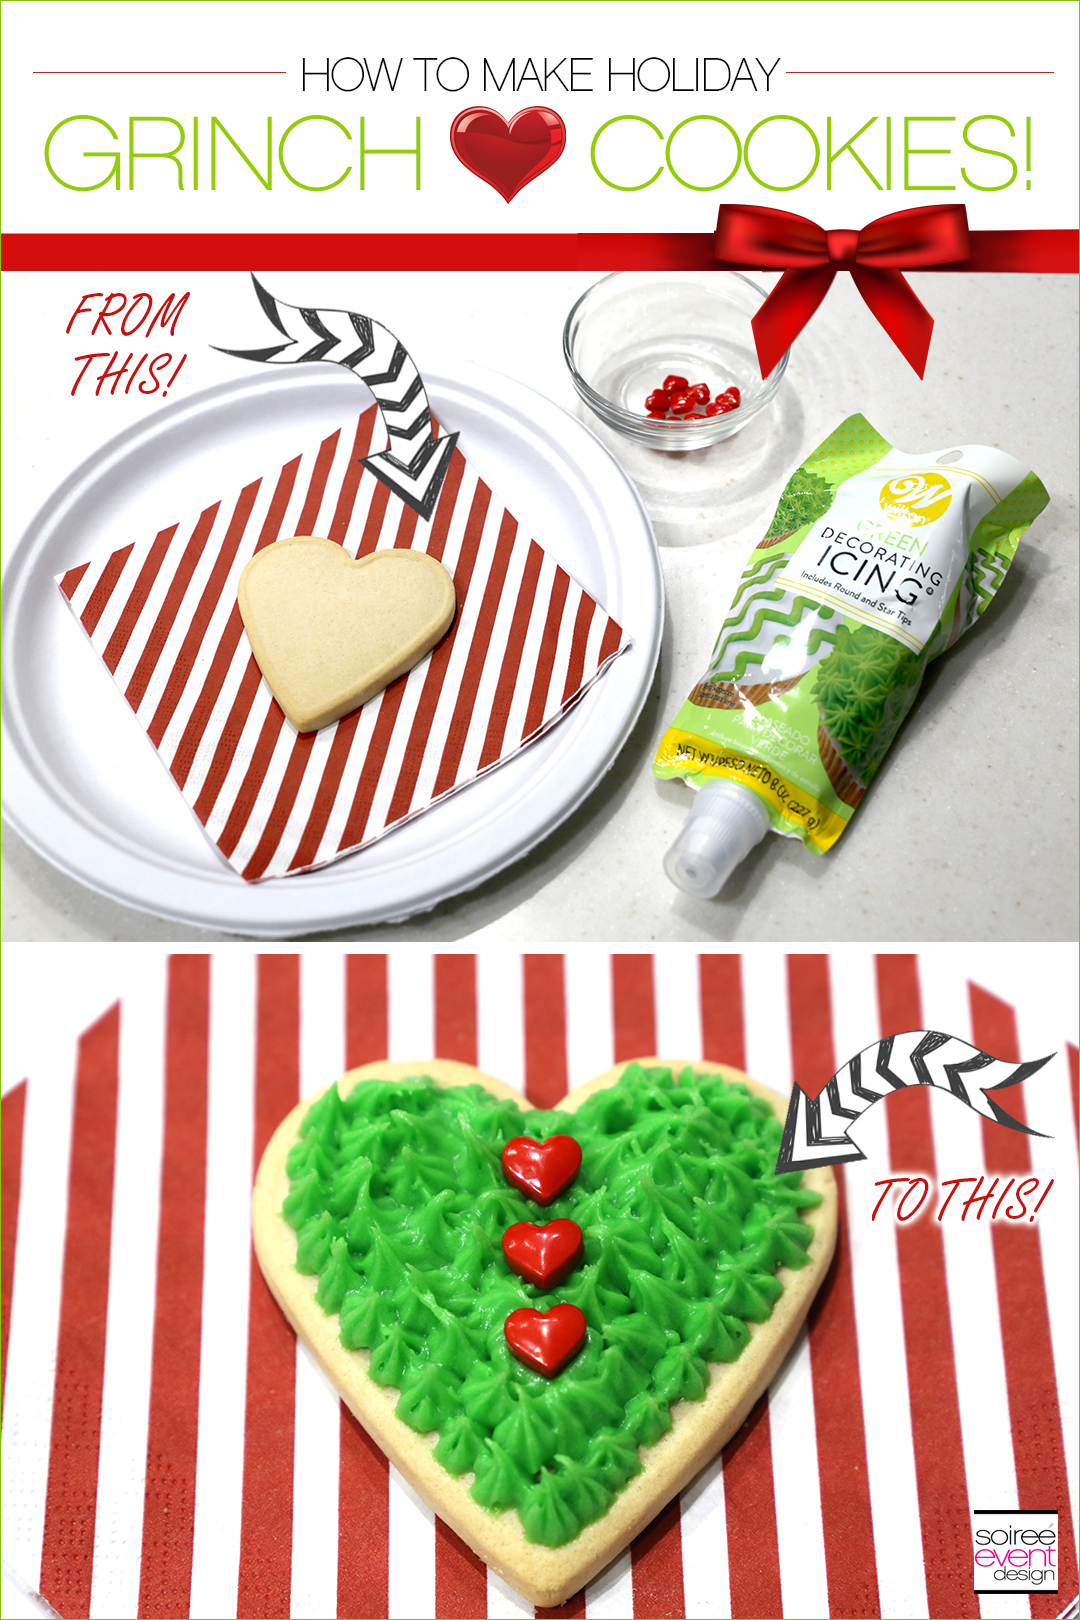 Grinch Dessert Ideas - Grinch Heart Cookies Tutorial